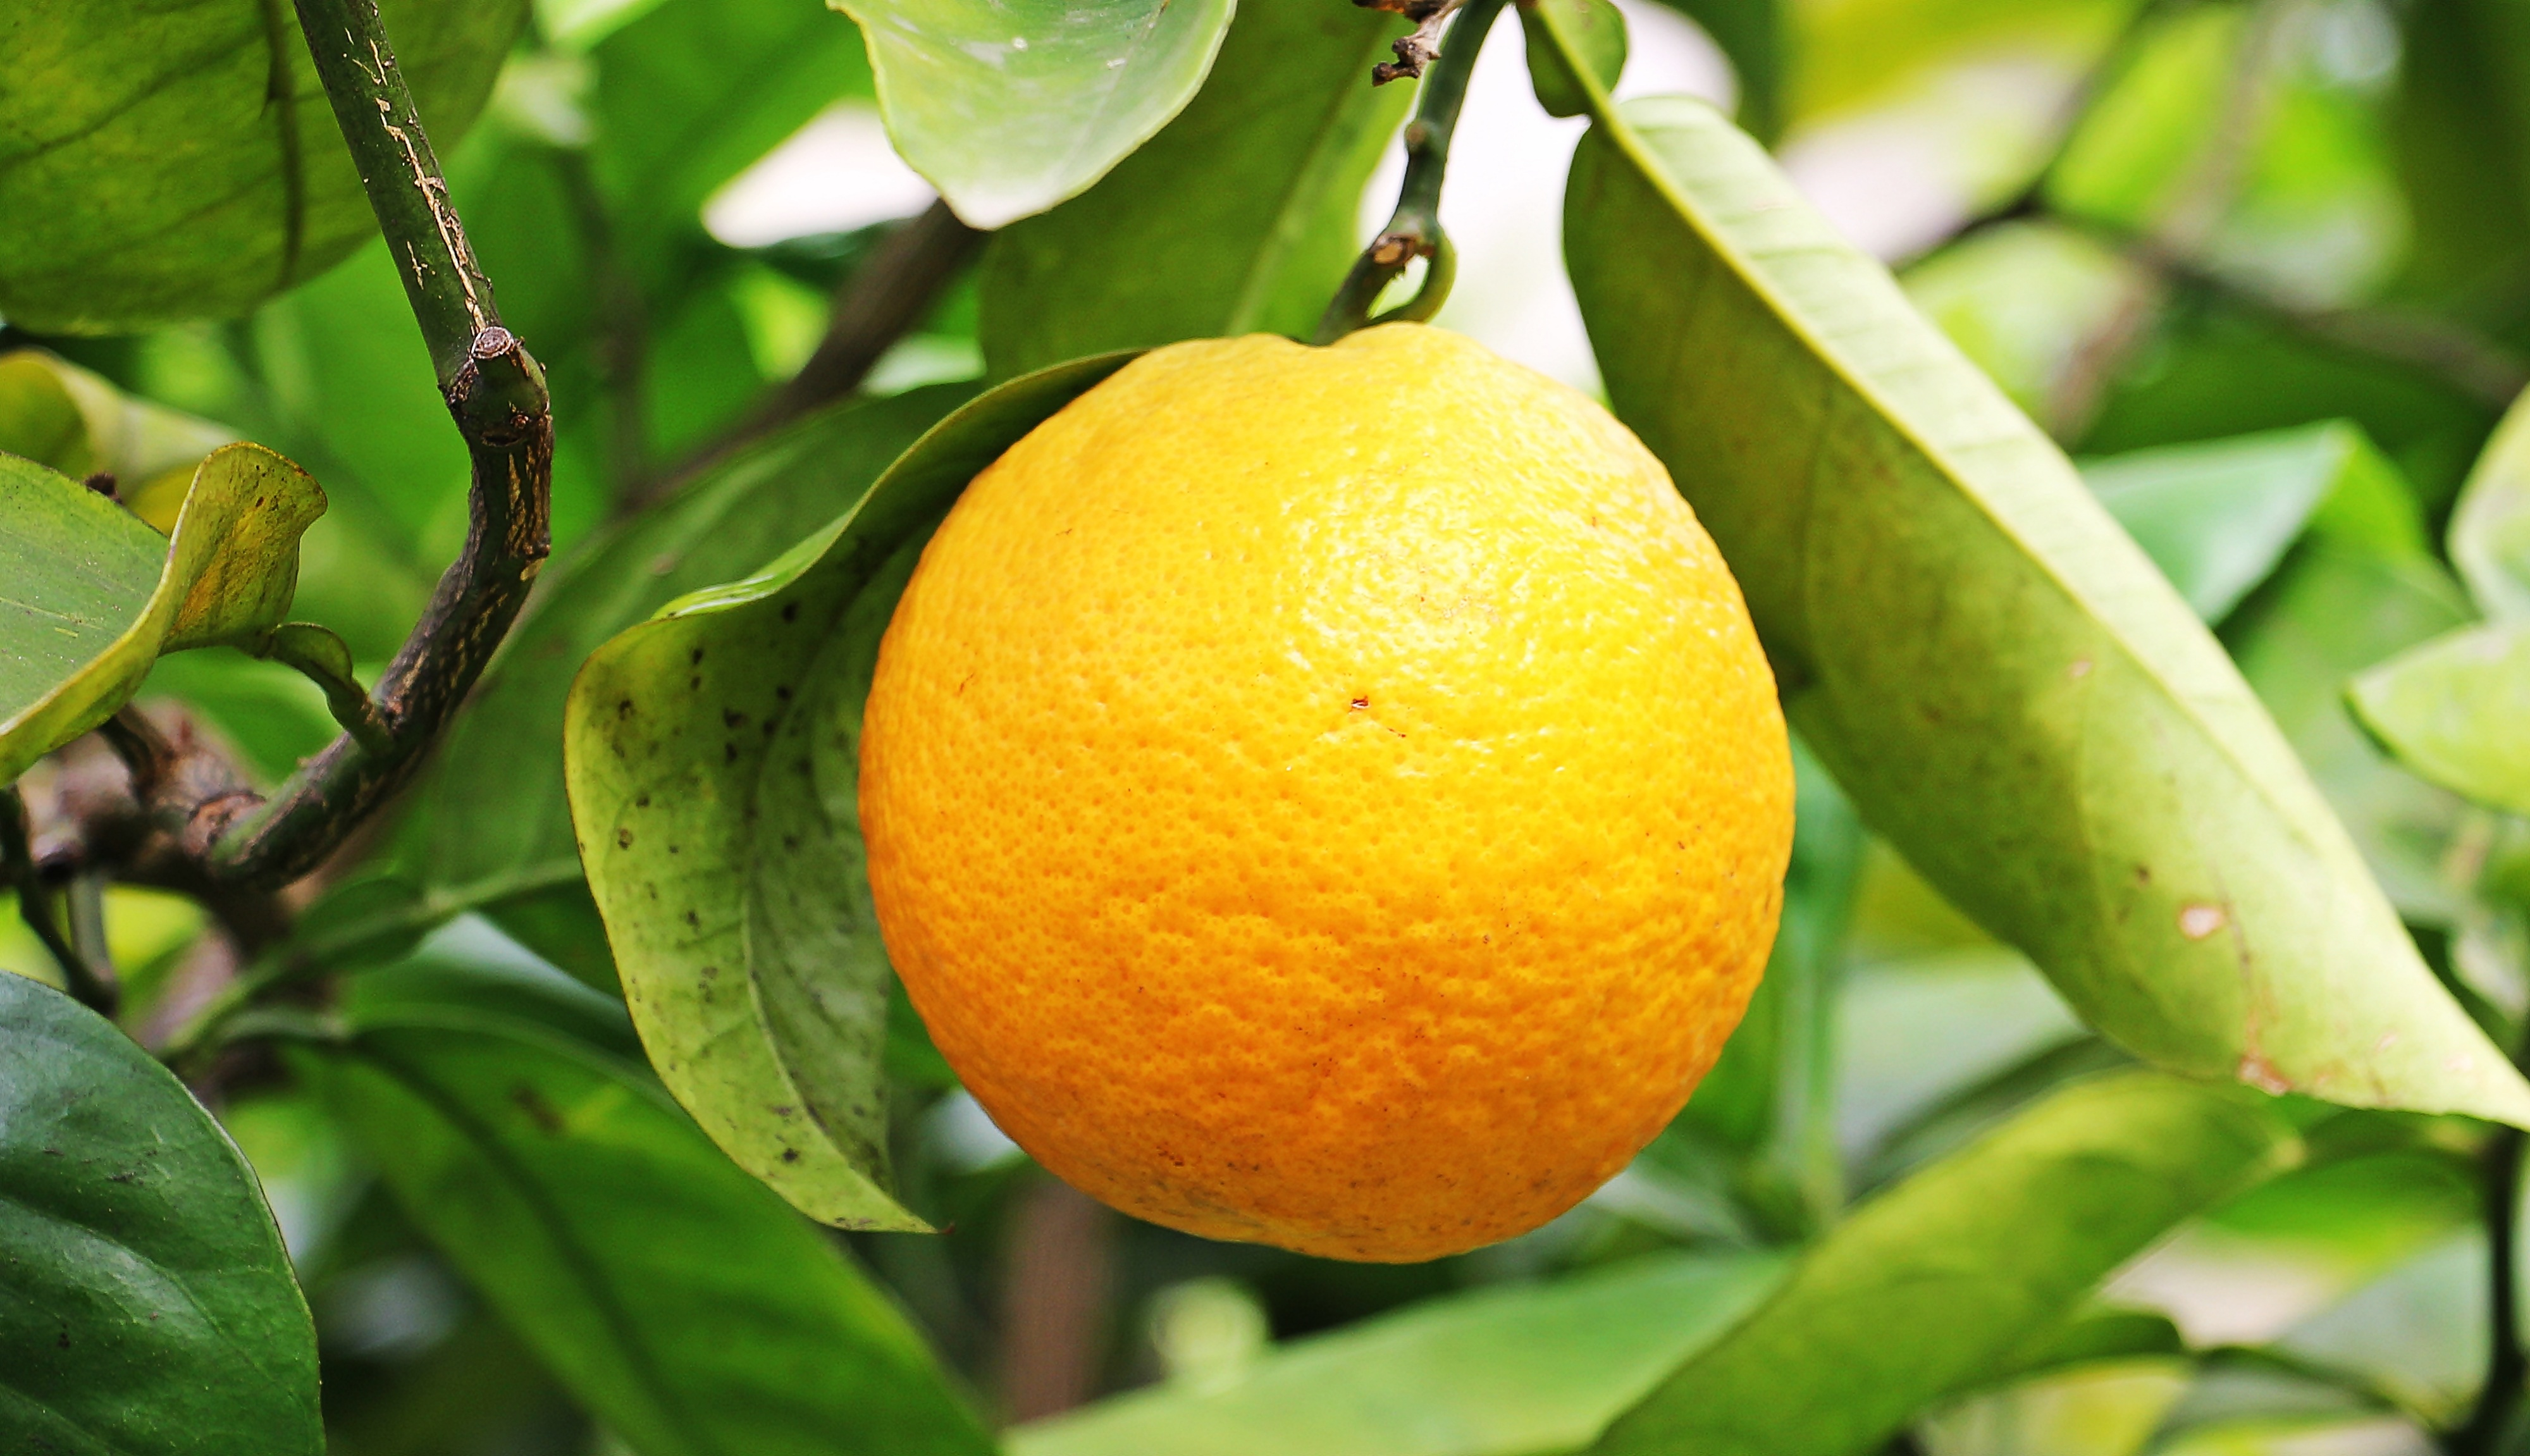 A quoi sert la vitamine c guide complet top 17 aliments riches en vitamine c therapeutes - A quoi sert le magnesium ...